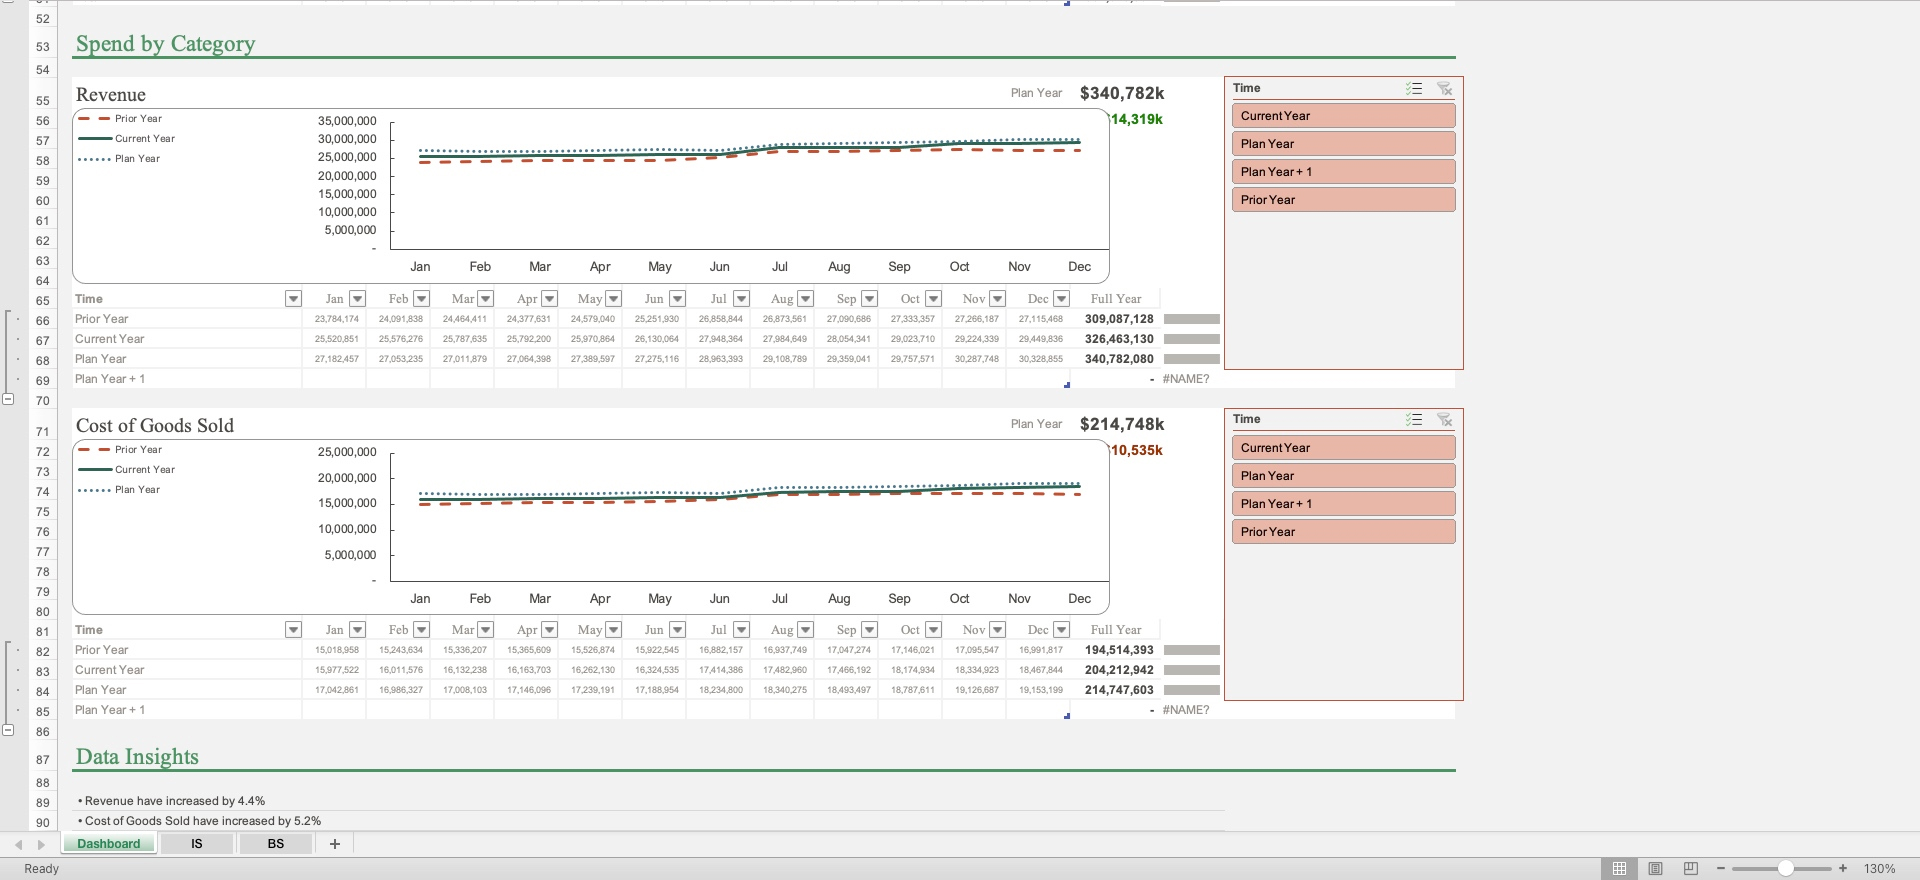 corpfinancialsdashboard-spendbycategory